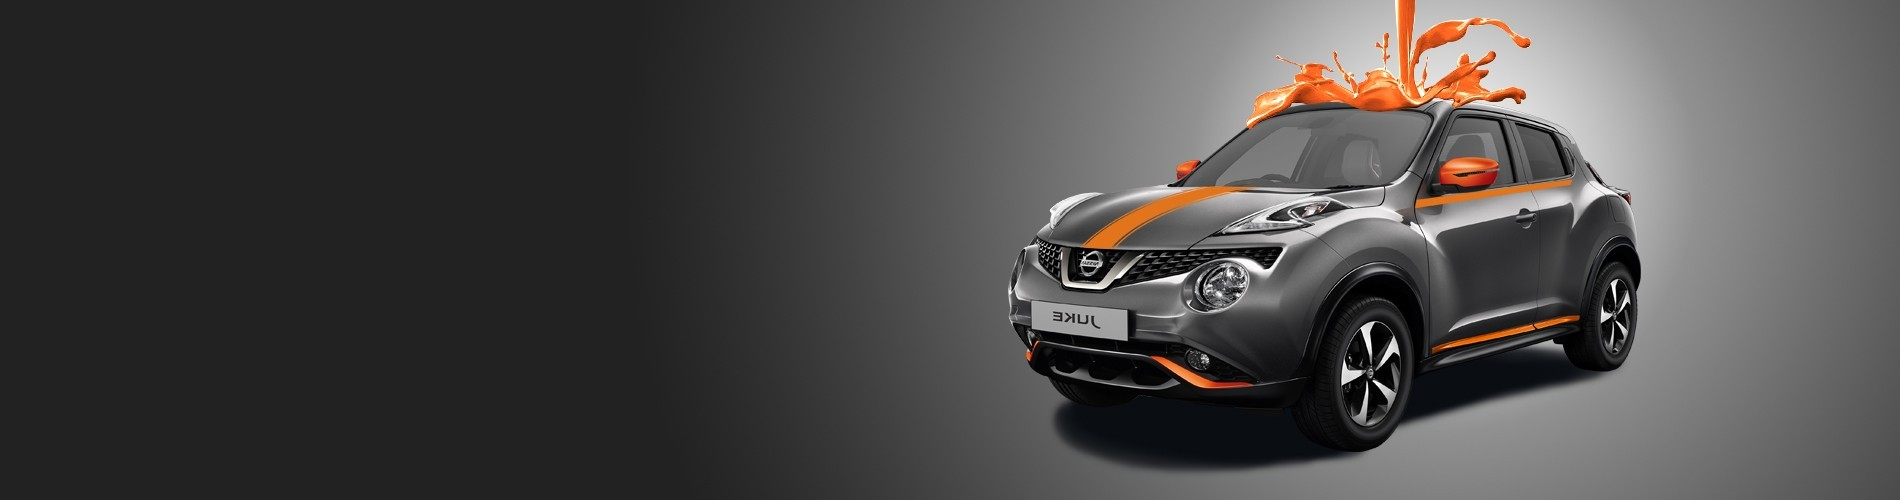 Nissan Juke Stickers